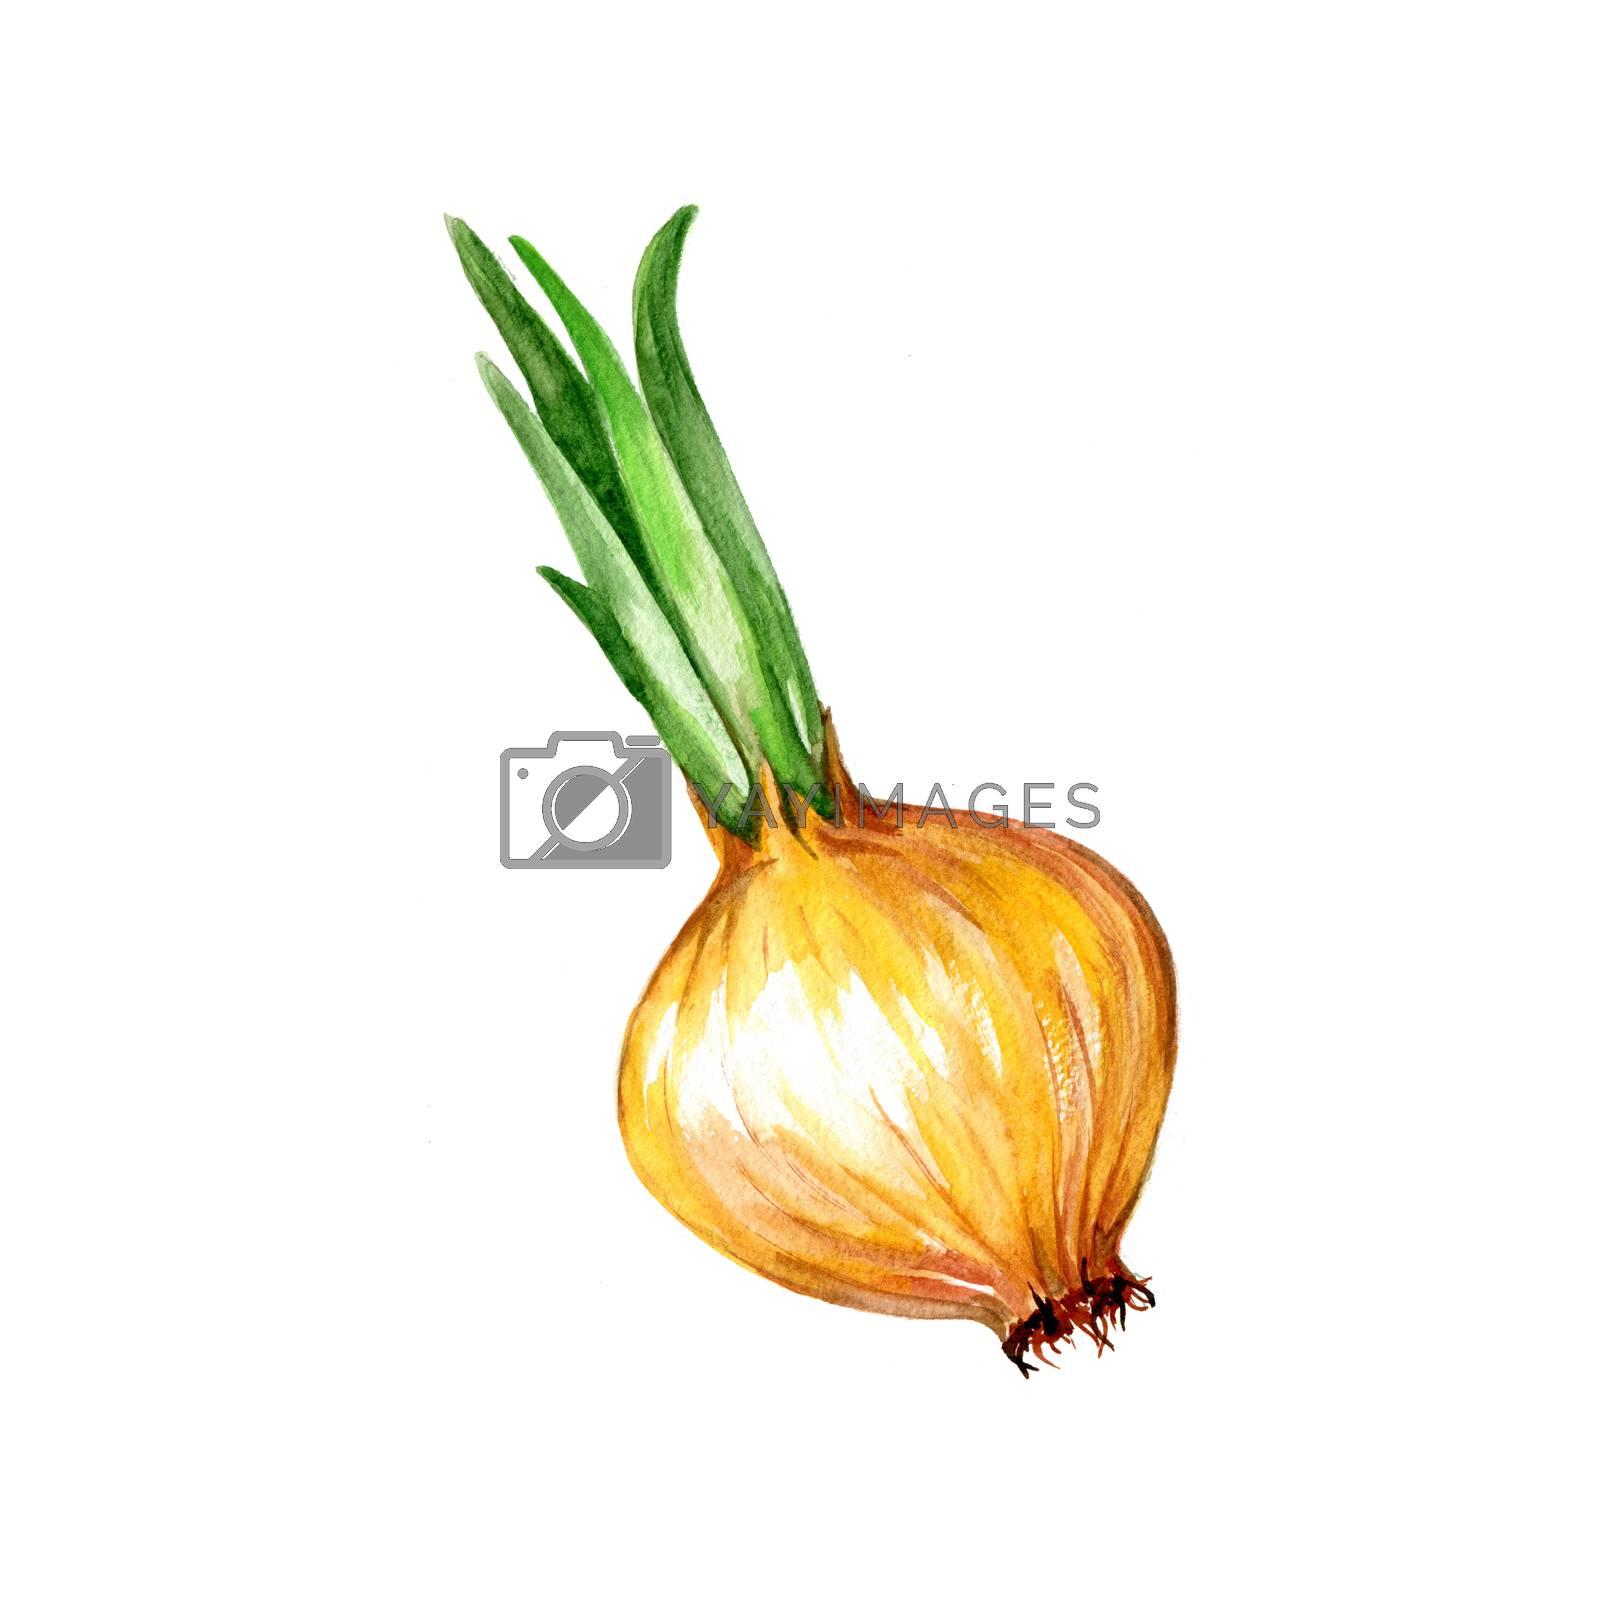 Watercolor Onion. Hand Drawn Illustration Organic Food Vegetarian Ingredient